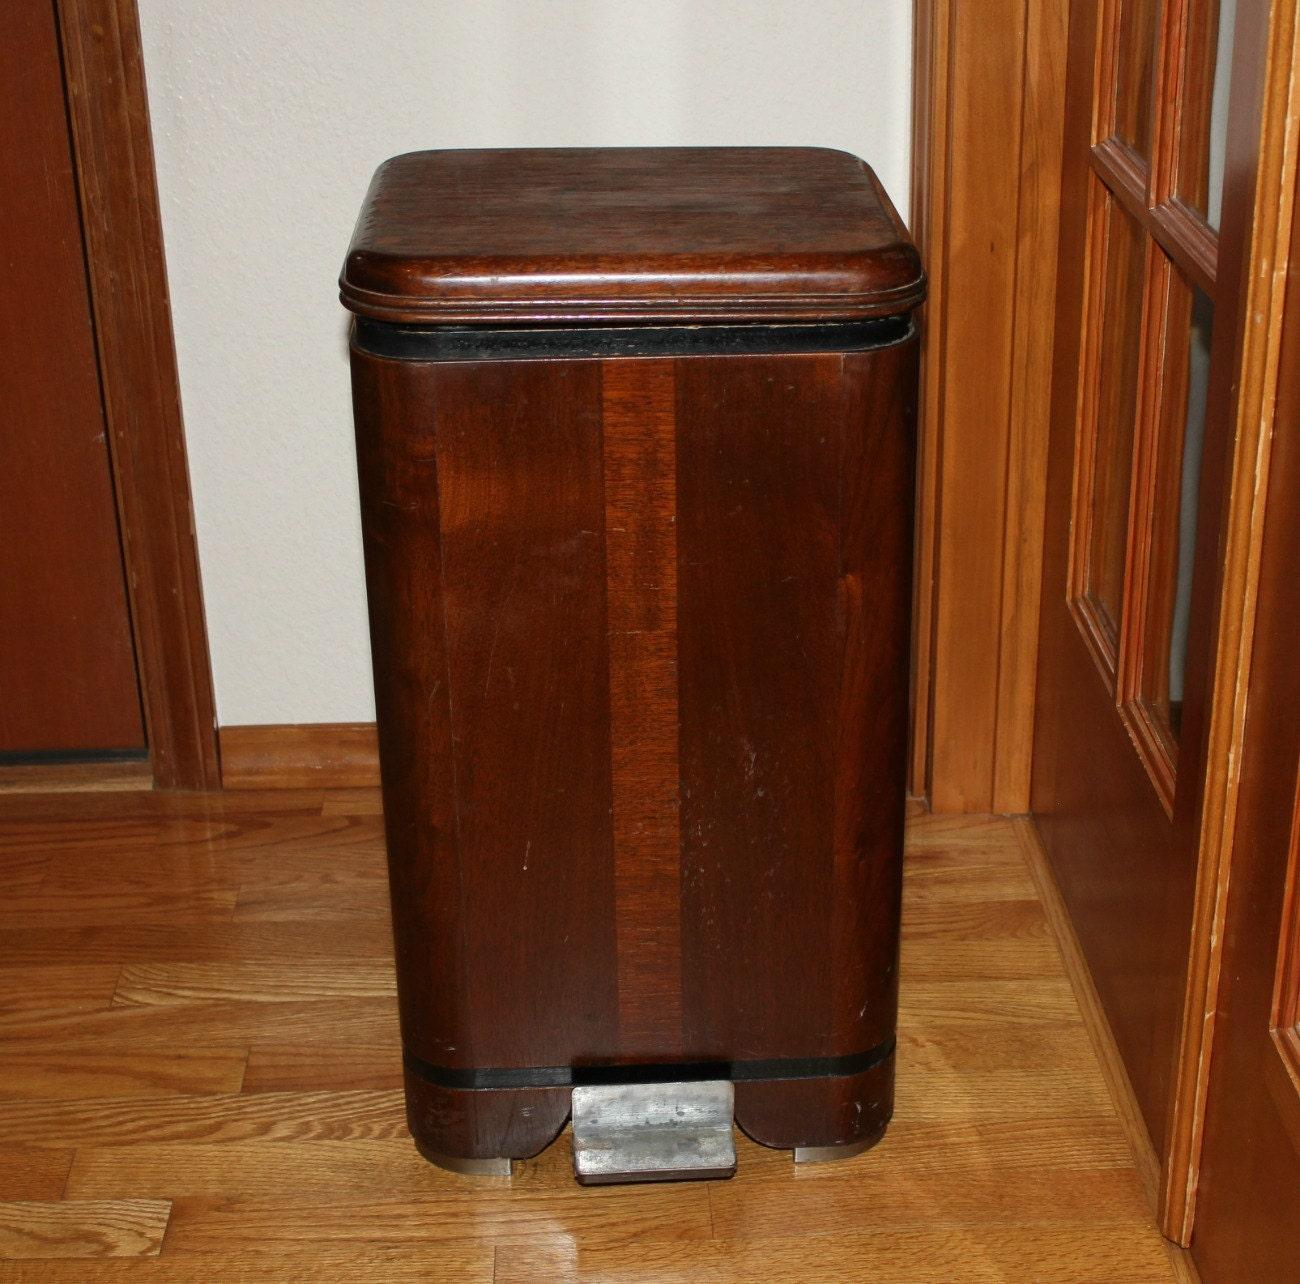 Wood Kitchen Trash Can   Waterfall Hamilton Trash Can Garbage Bin Vintage  Wood Step Lid